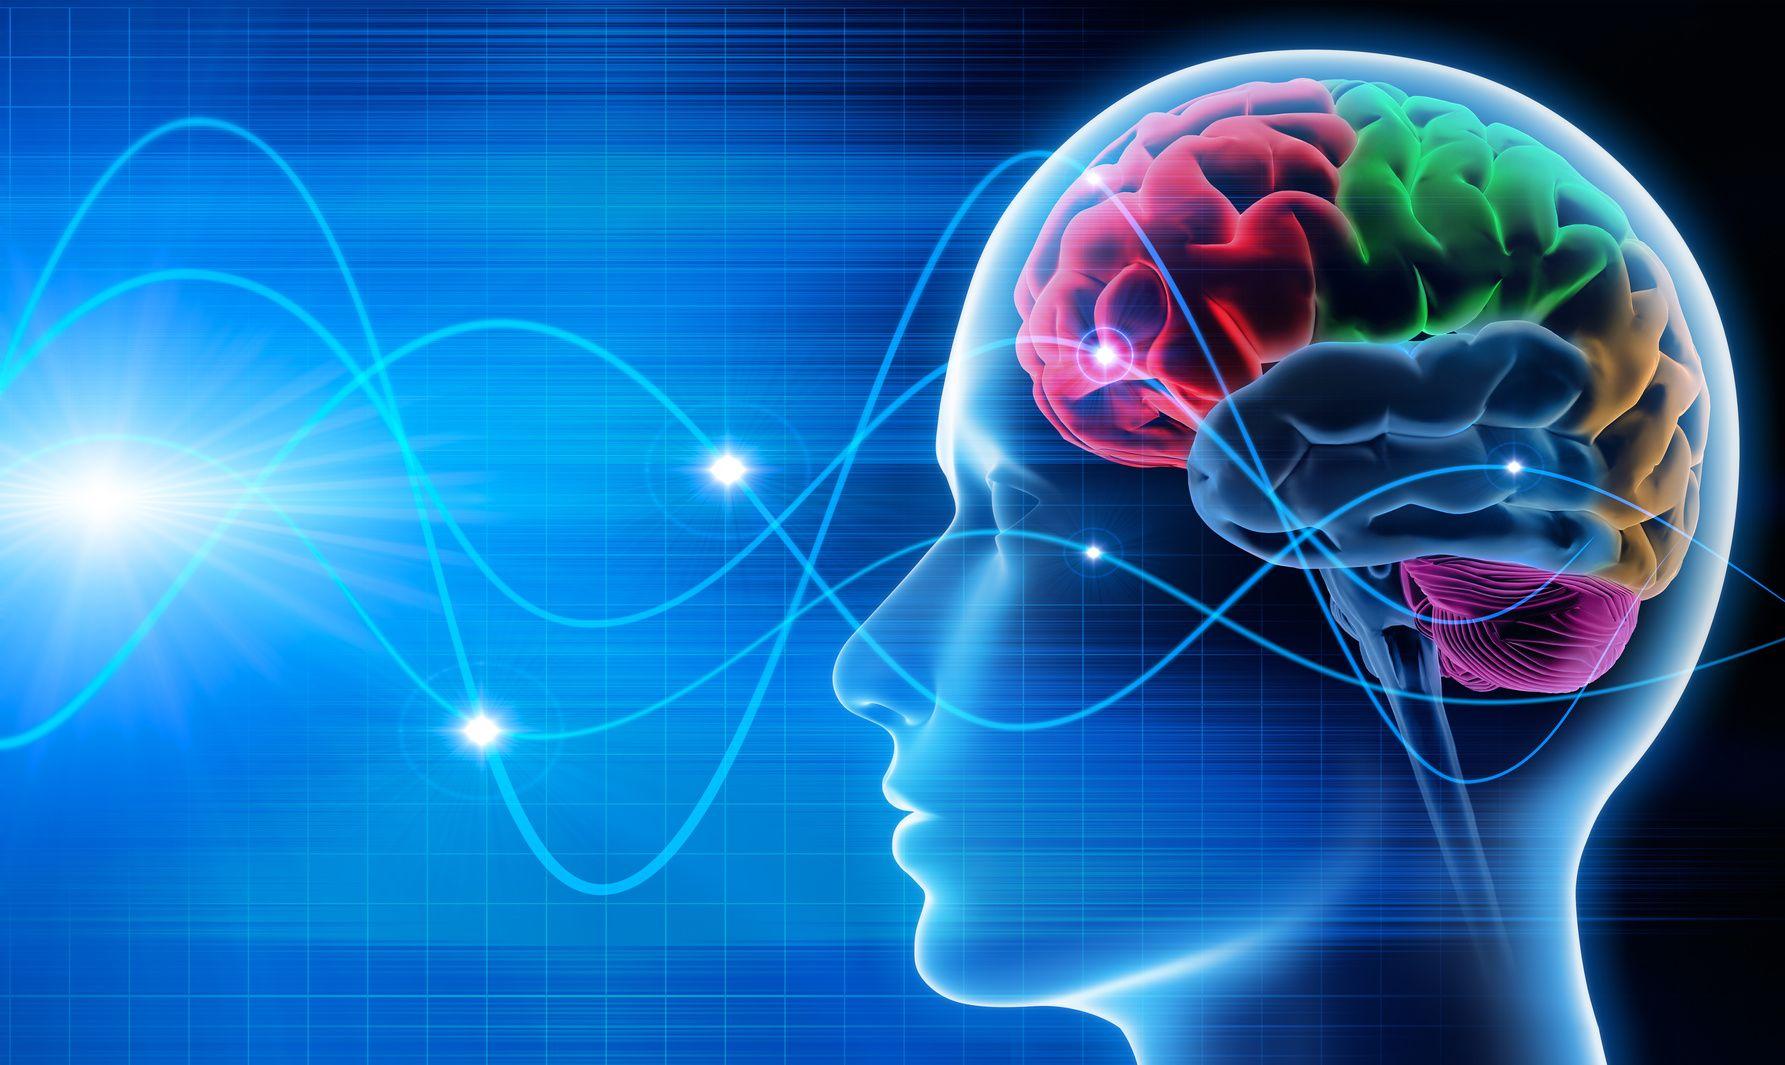 Neurociência e Coaching no Desenvolvimento das Habilidades Mentais | IBC Coaching